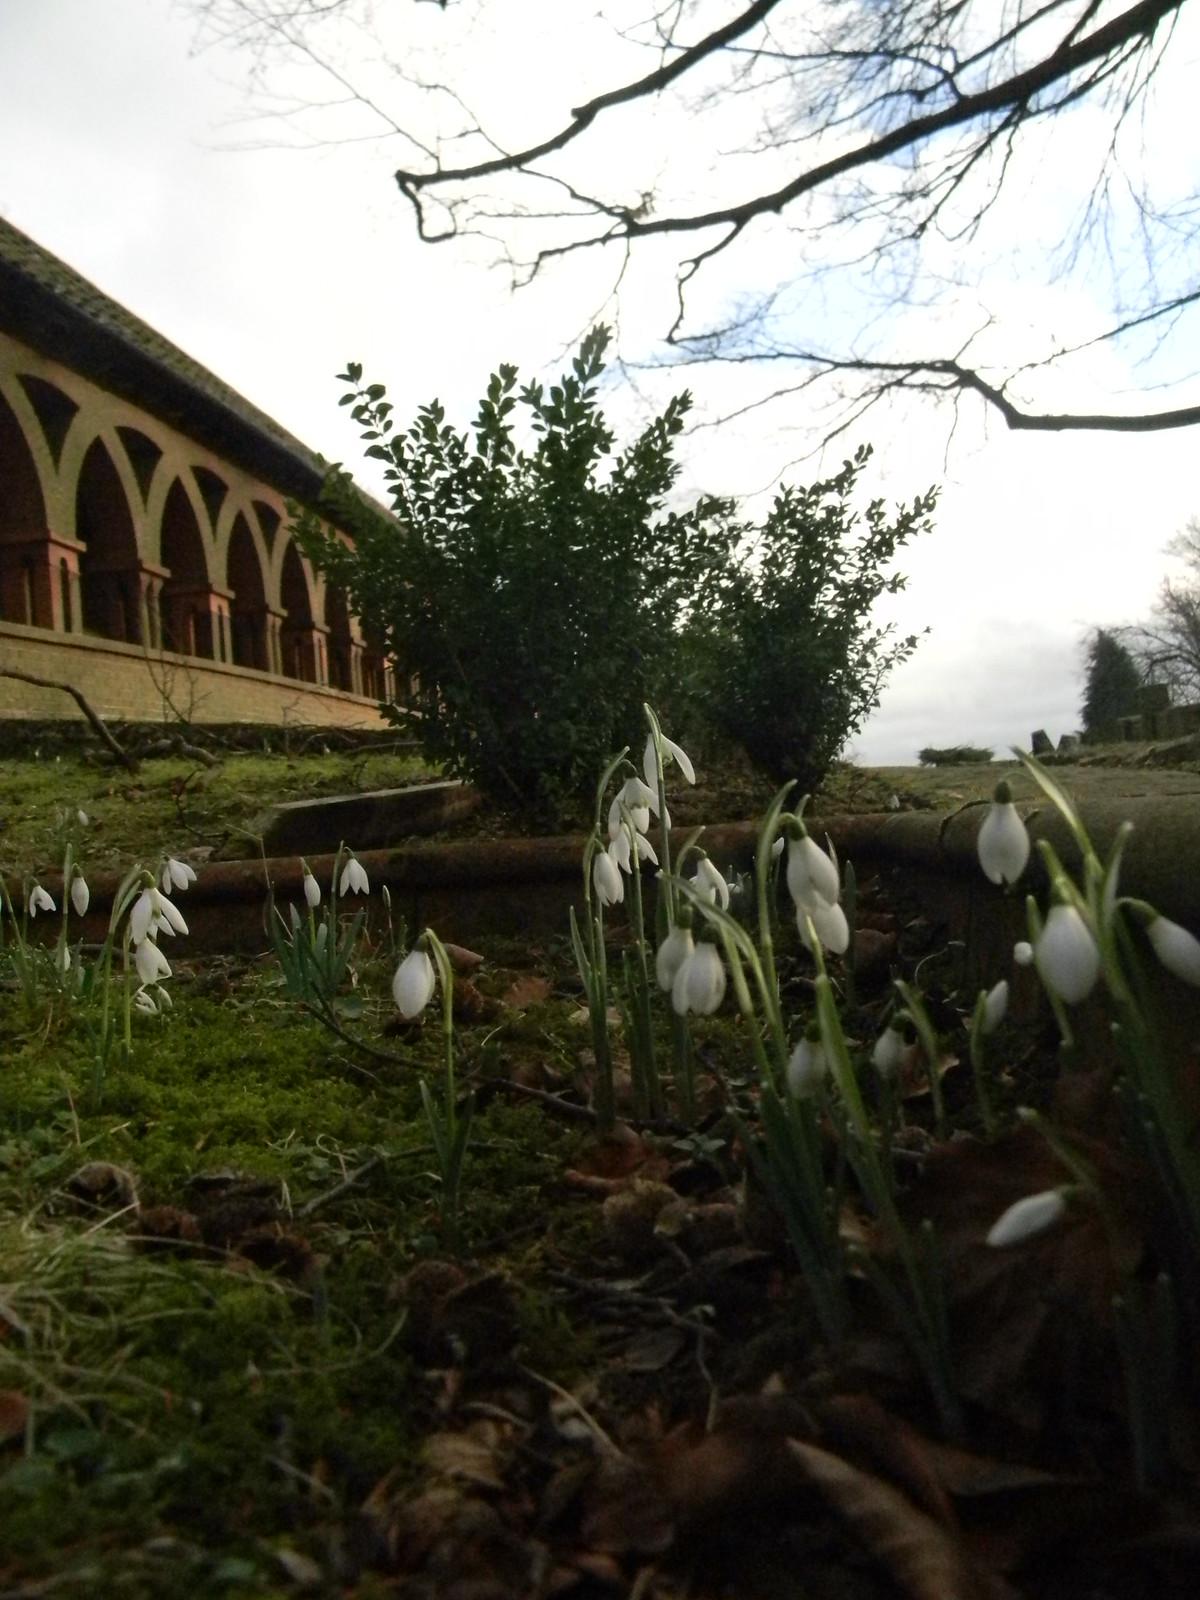 Snowdrops - Watts chapel Wanborough to Godalming